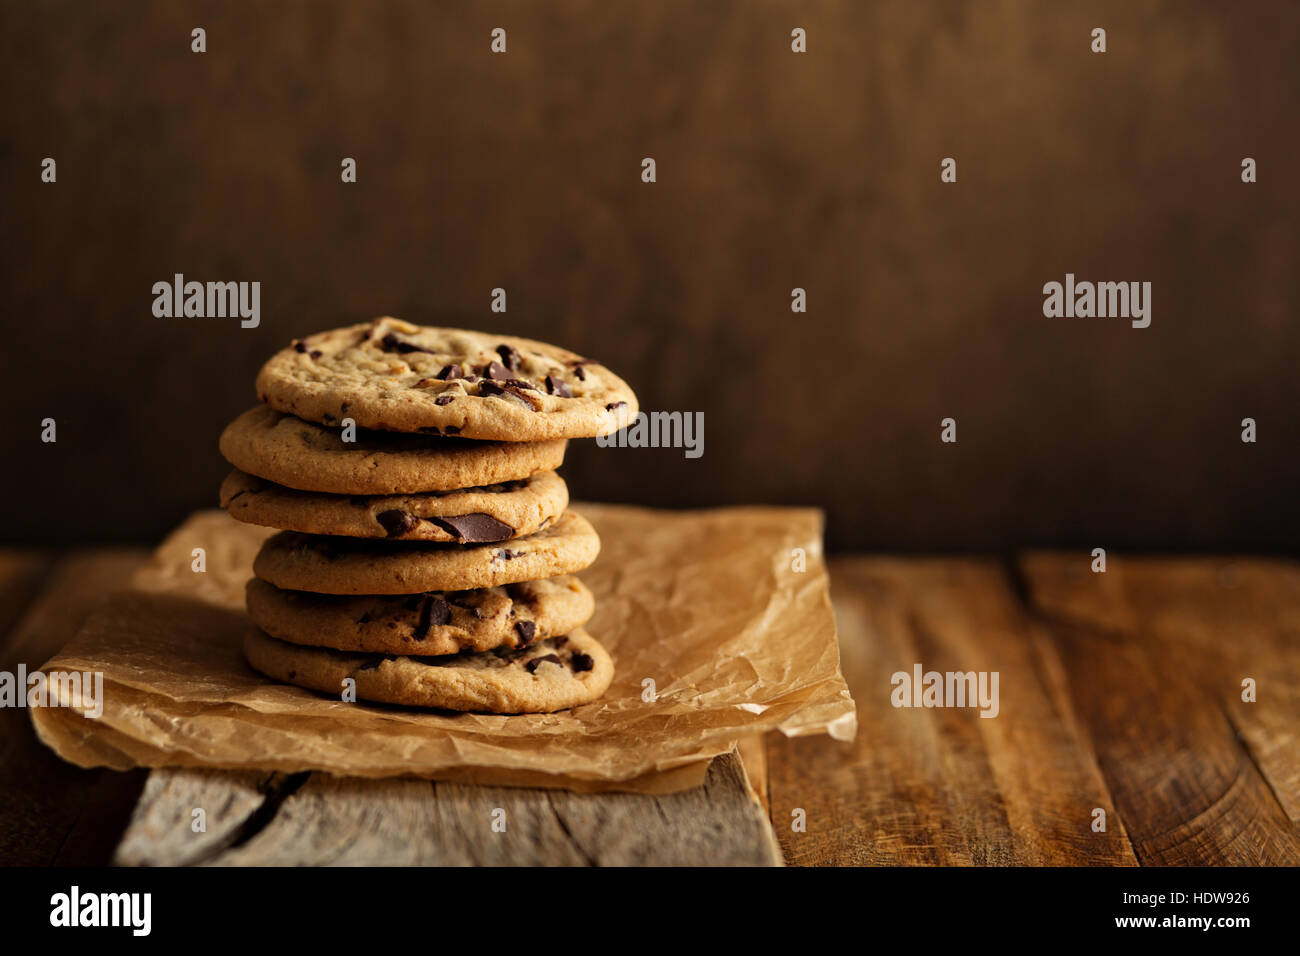 Galletas con trocitos de chocolate casero con leche Foto de stock